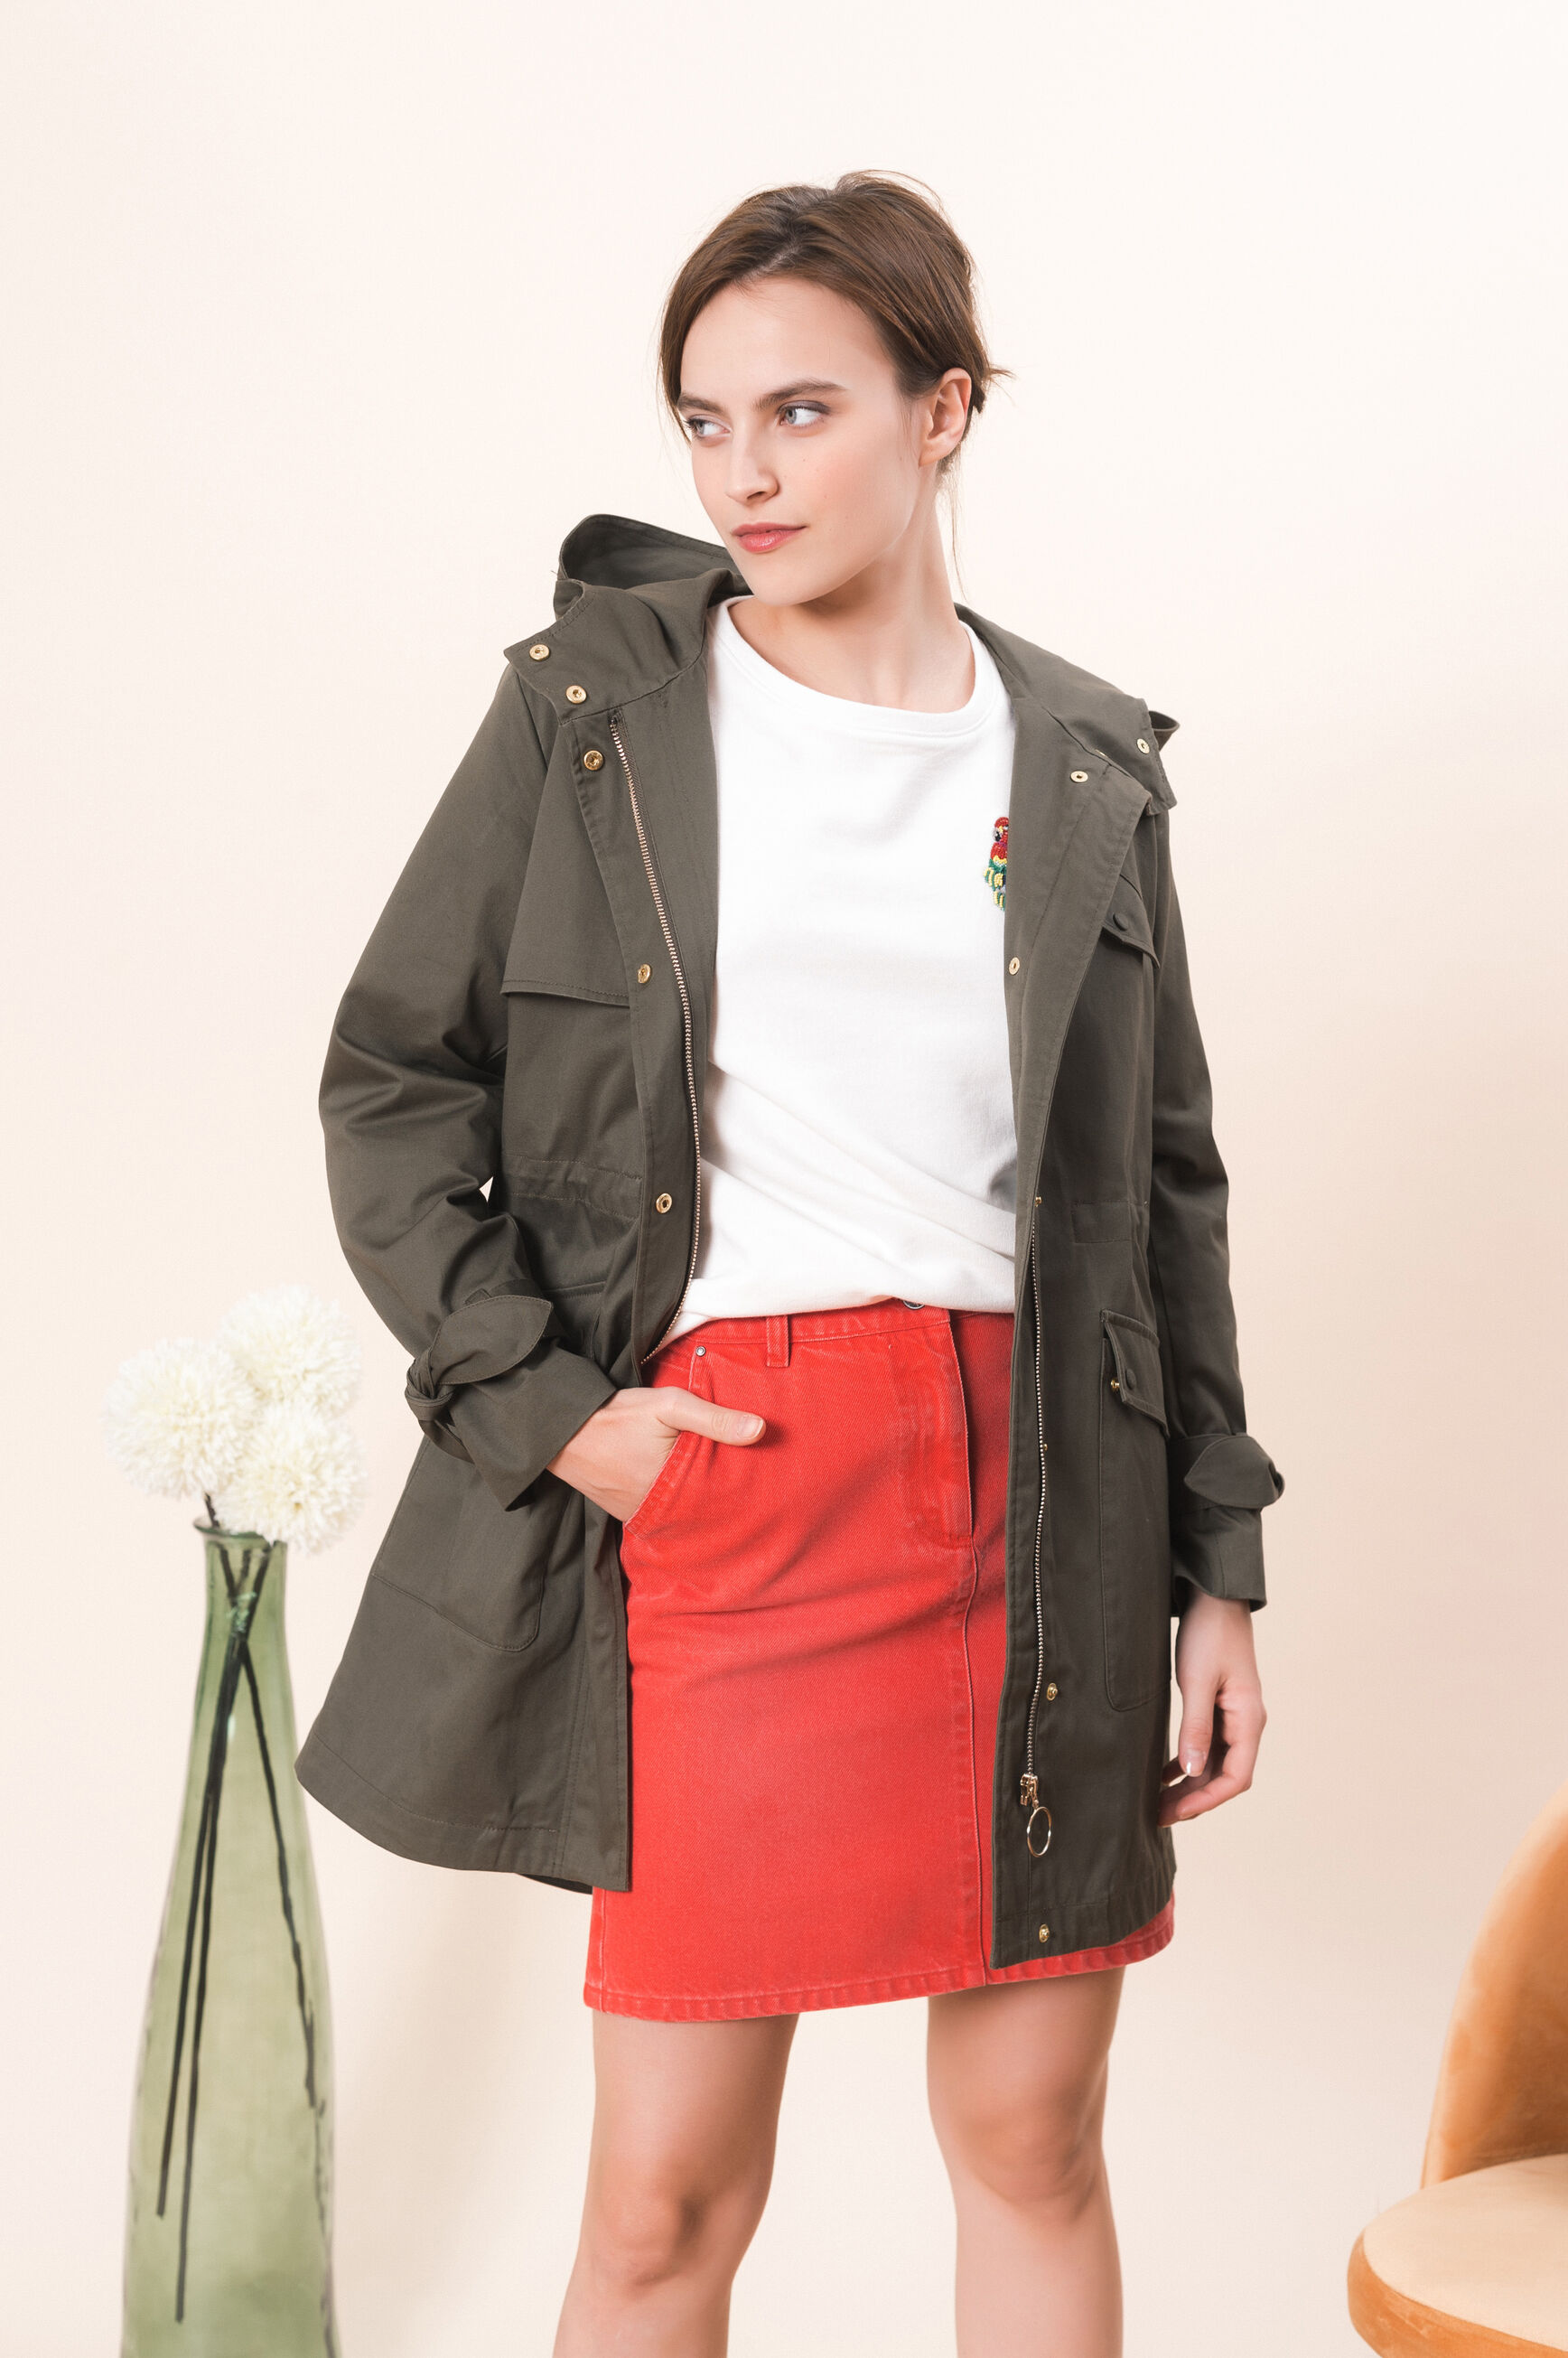 elegante plumas de y Coat Womantu chaqueta eleganteCaroll KJl1Fc